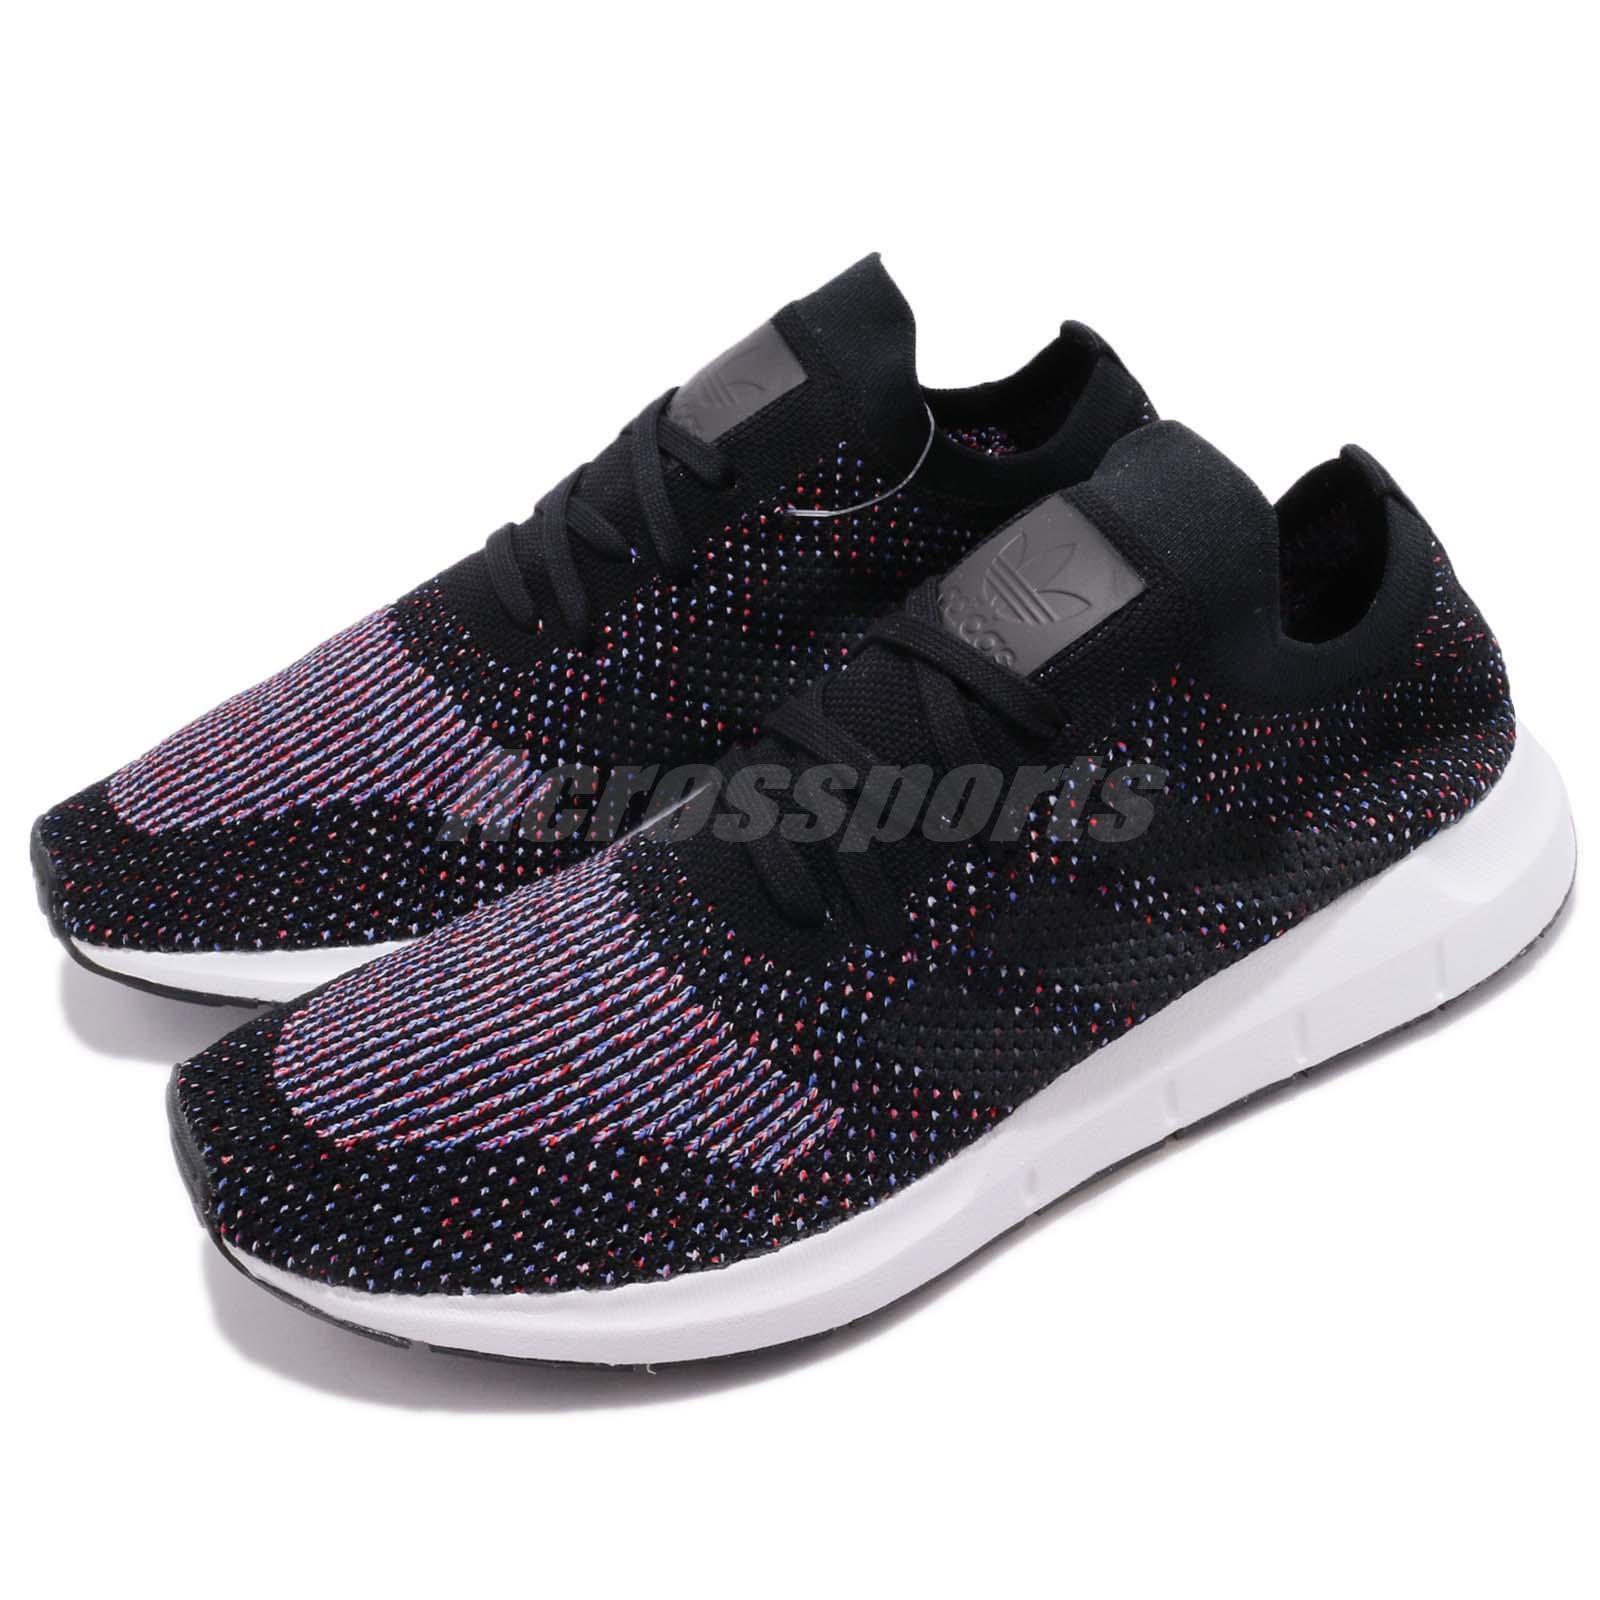 fa82e6f49 ... Adidas Originals Swift Swift Swift Run PK Primeknit Hombre Lifestyle  Running Zapatos Pick 1 fabacc ...